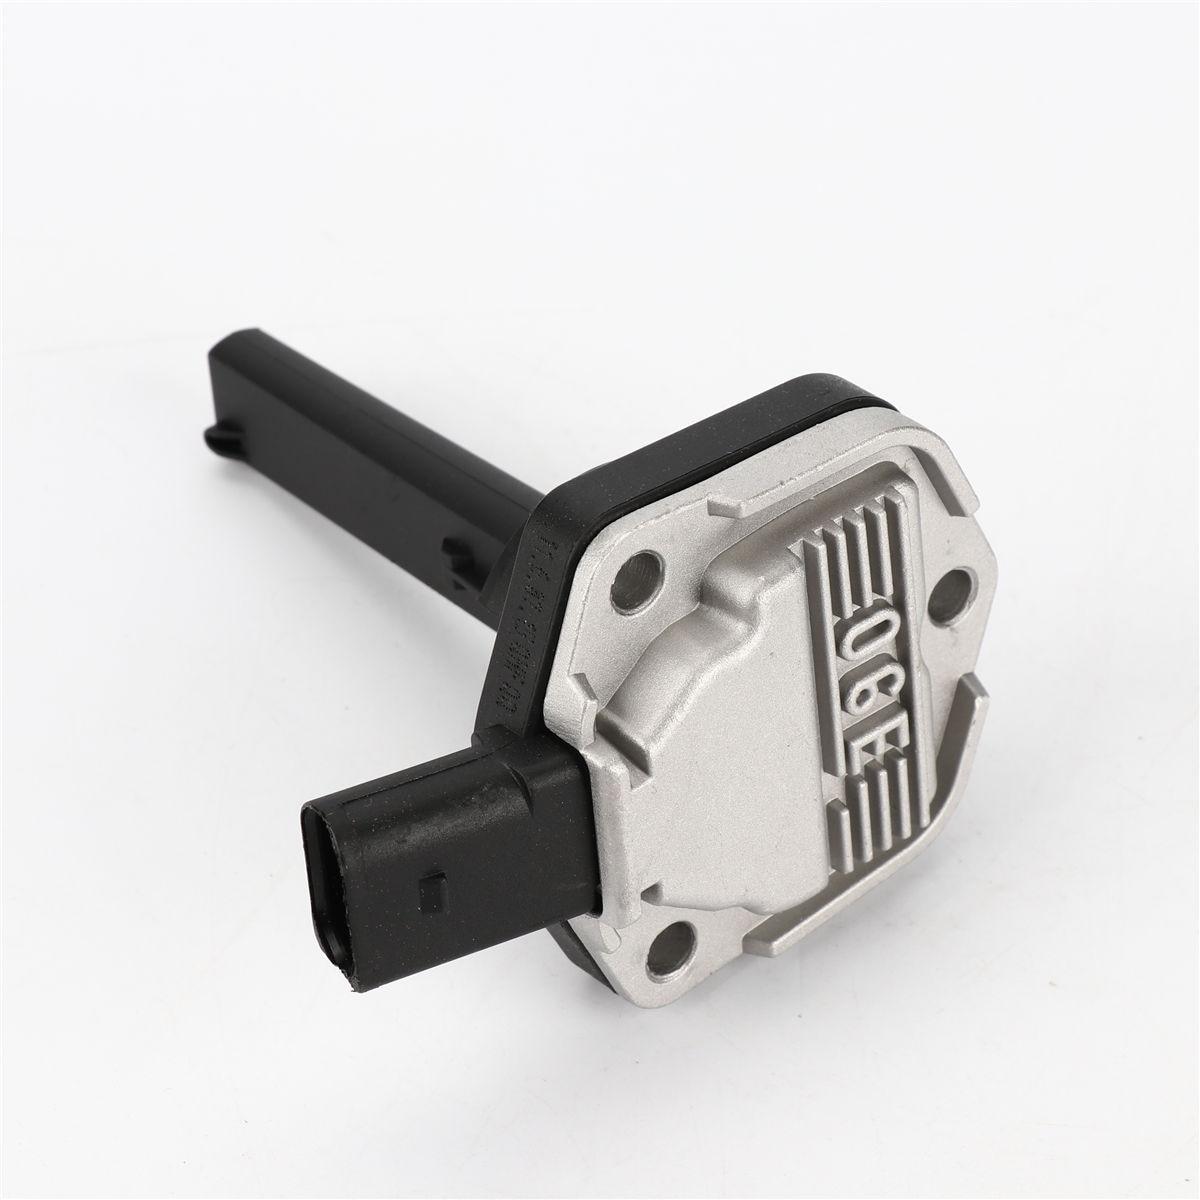 High Quality Engine Oil Level Sensor for Audi A3 A4 A6 A8 TT Q7 06E 907 660 Touran Touareg Caddy EOS Tiguan CC Beetle EOS